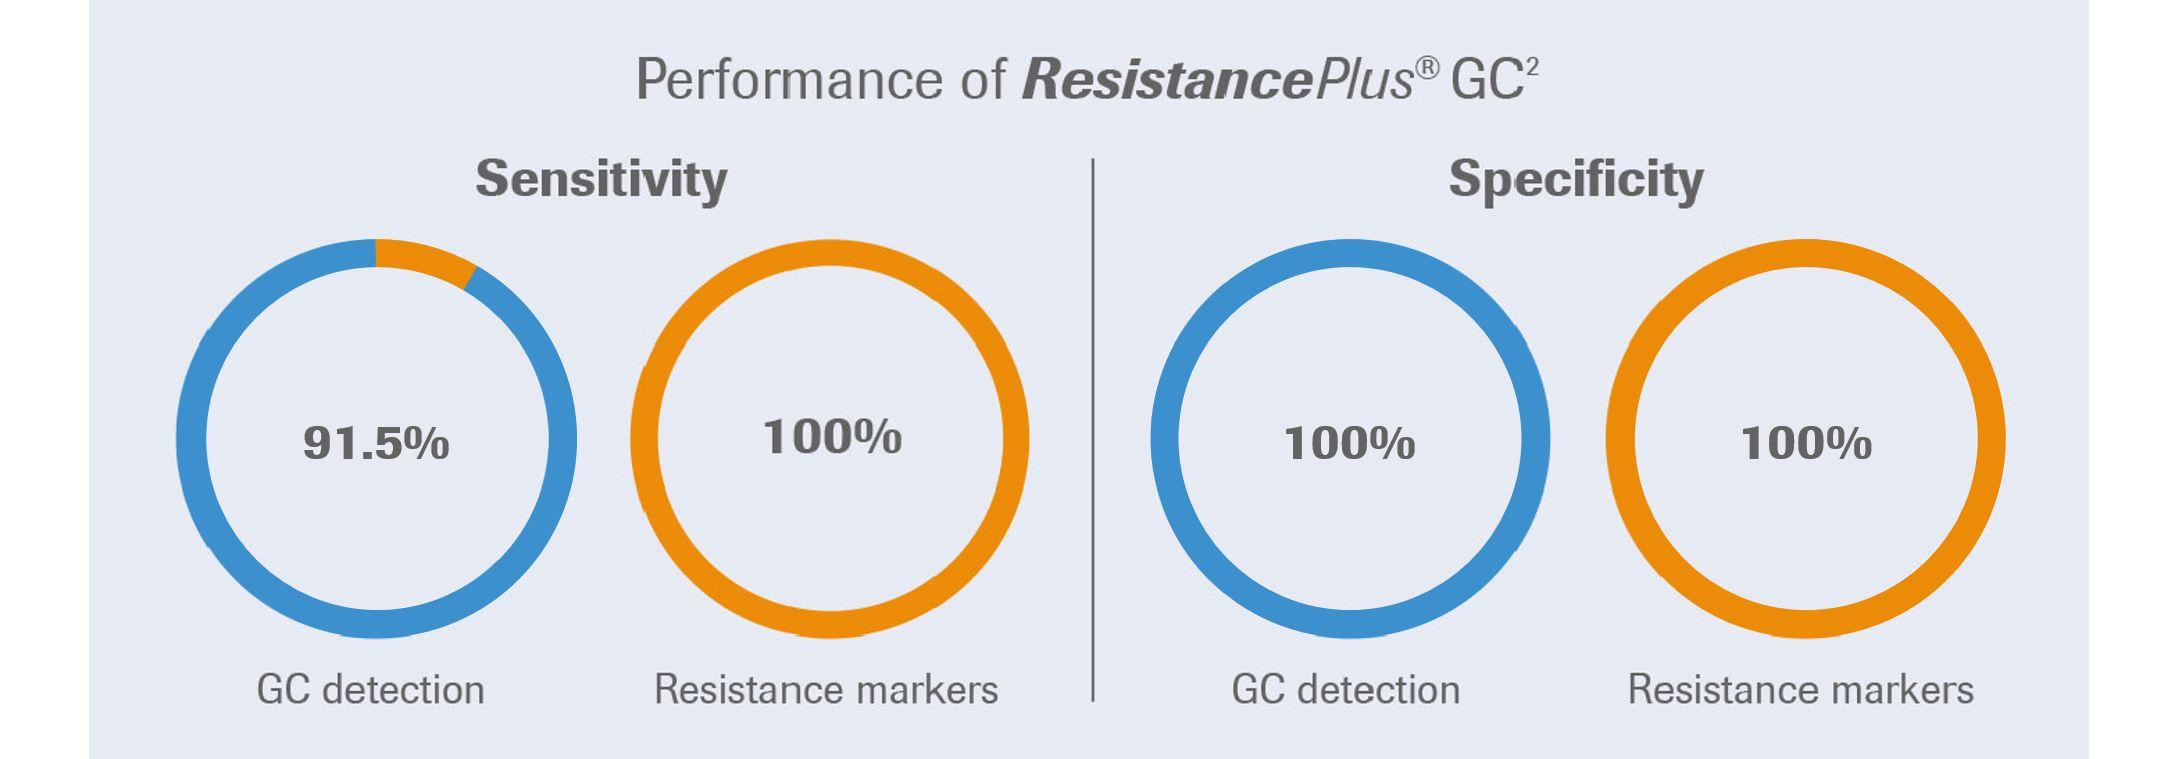 ResistancePlus® GC sensitivity and specificity performance diagram